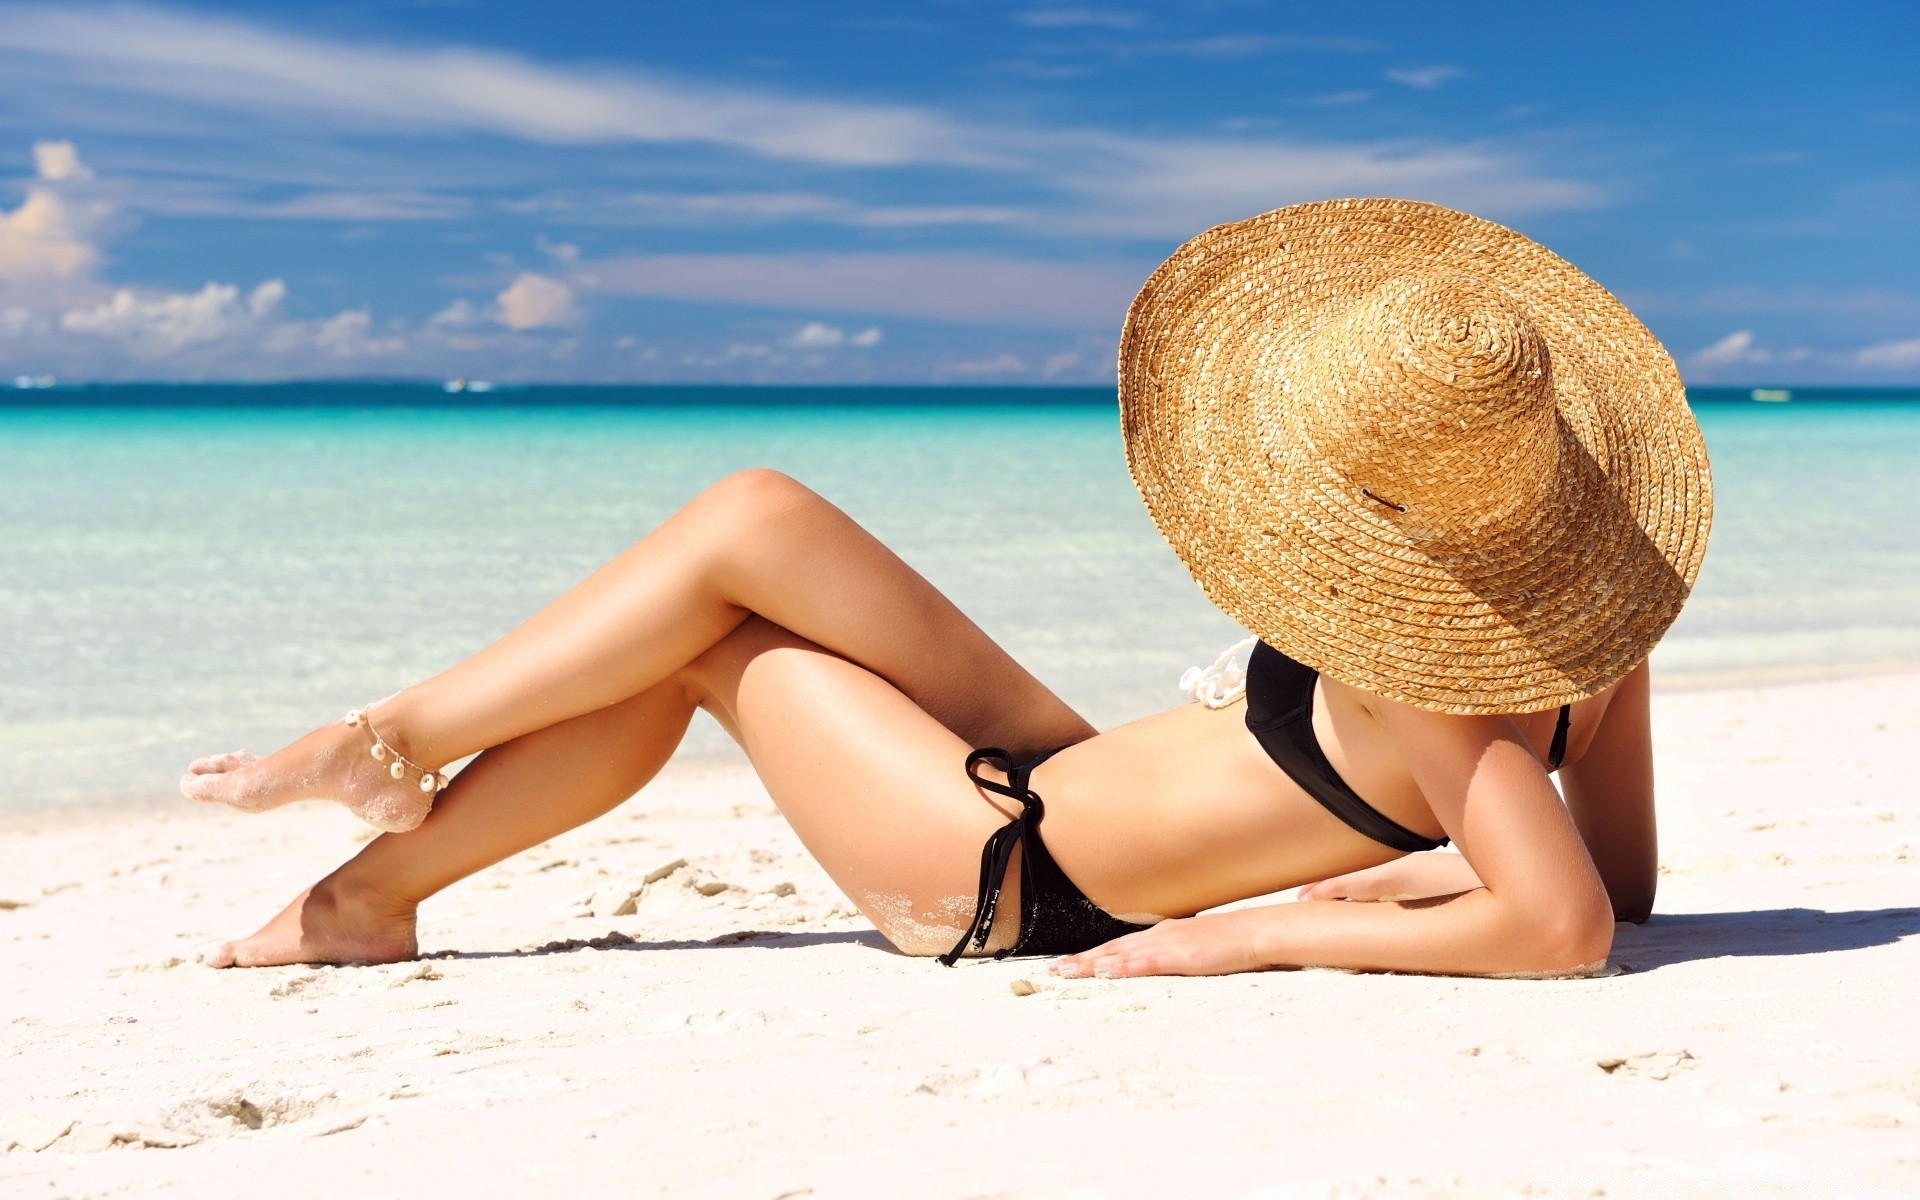 Sunbathing On The Beach Phone Wallpapers